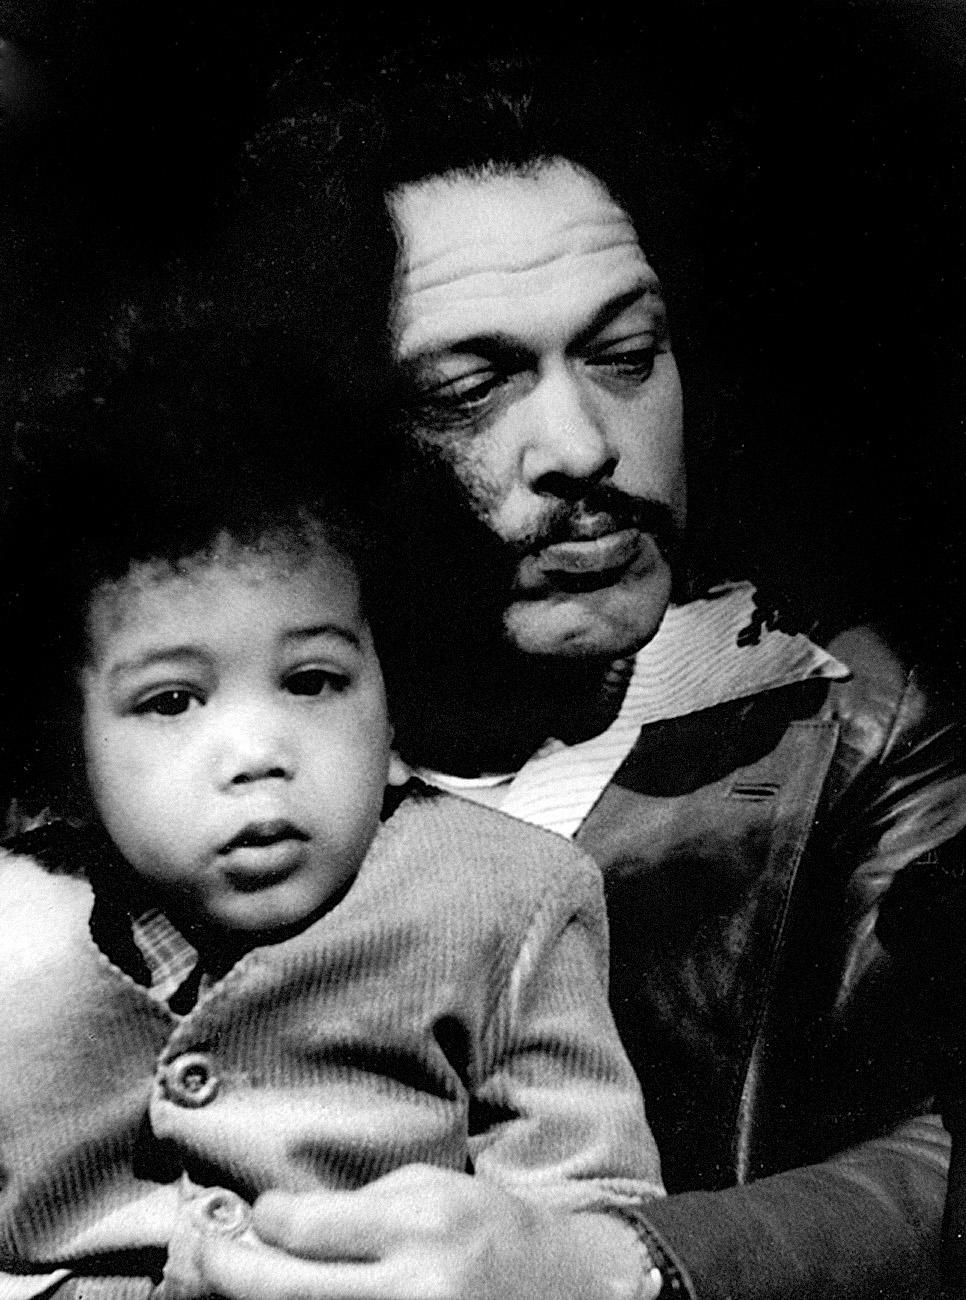 Lyman with his son Lyman III. Photo by Leni Sinclair.